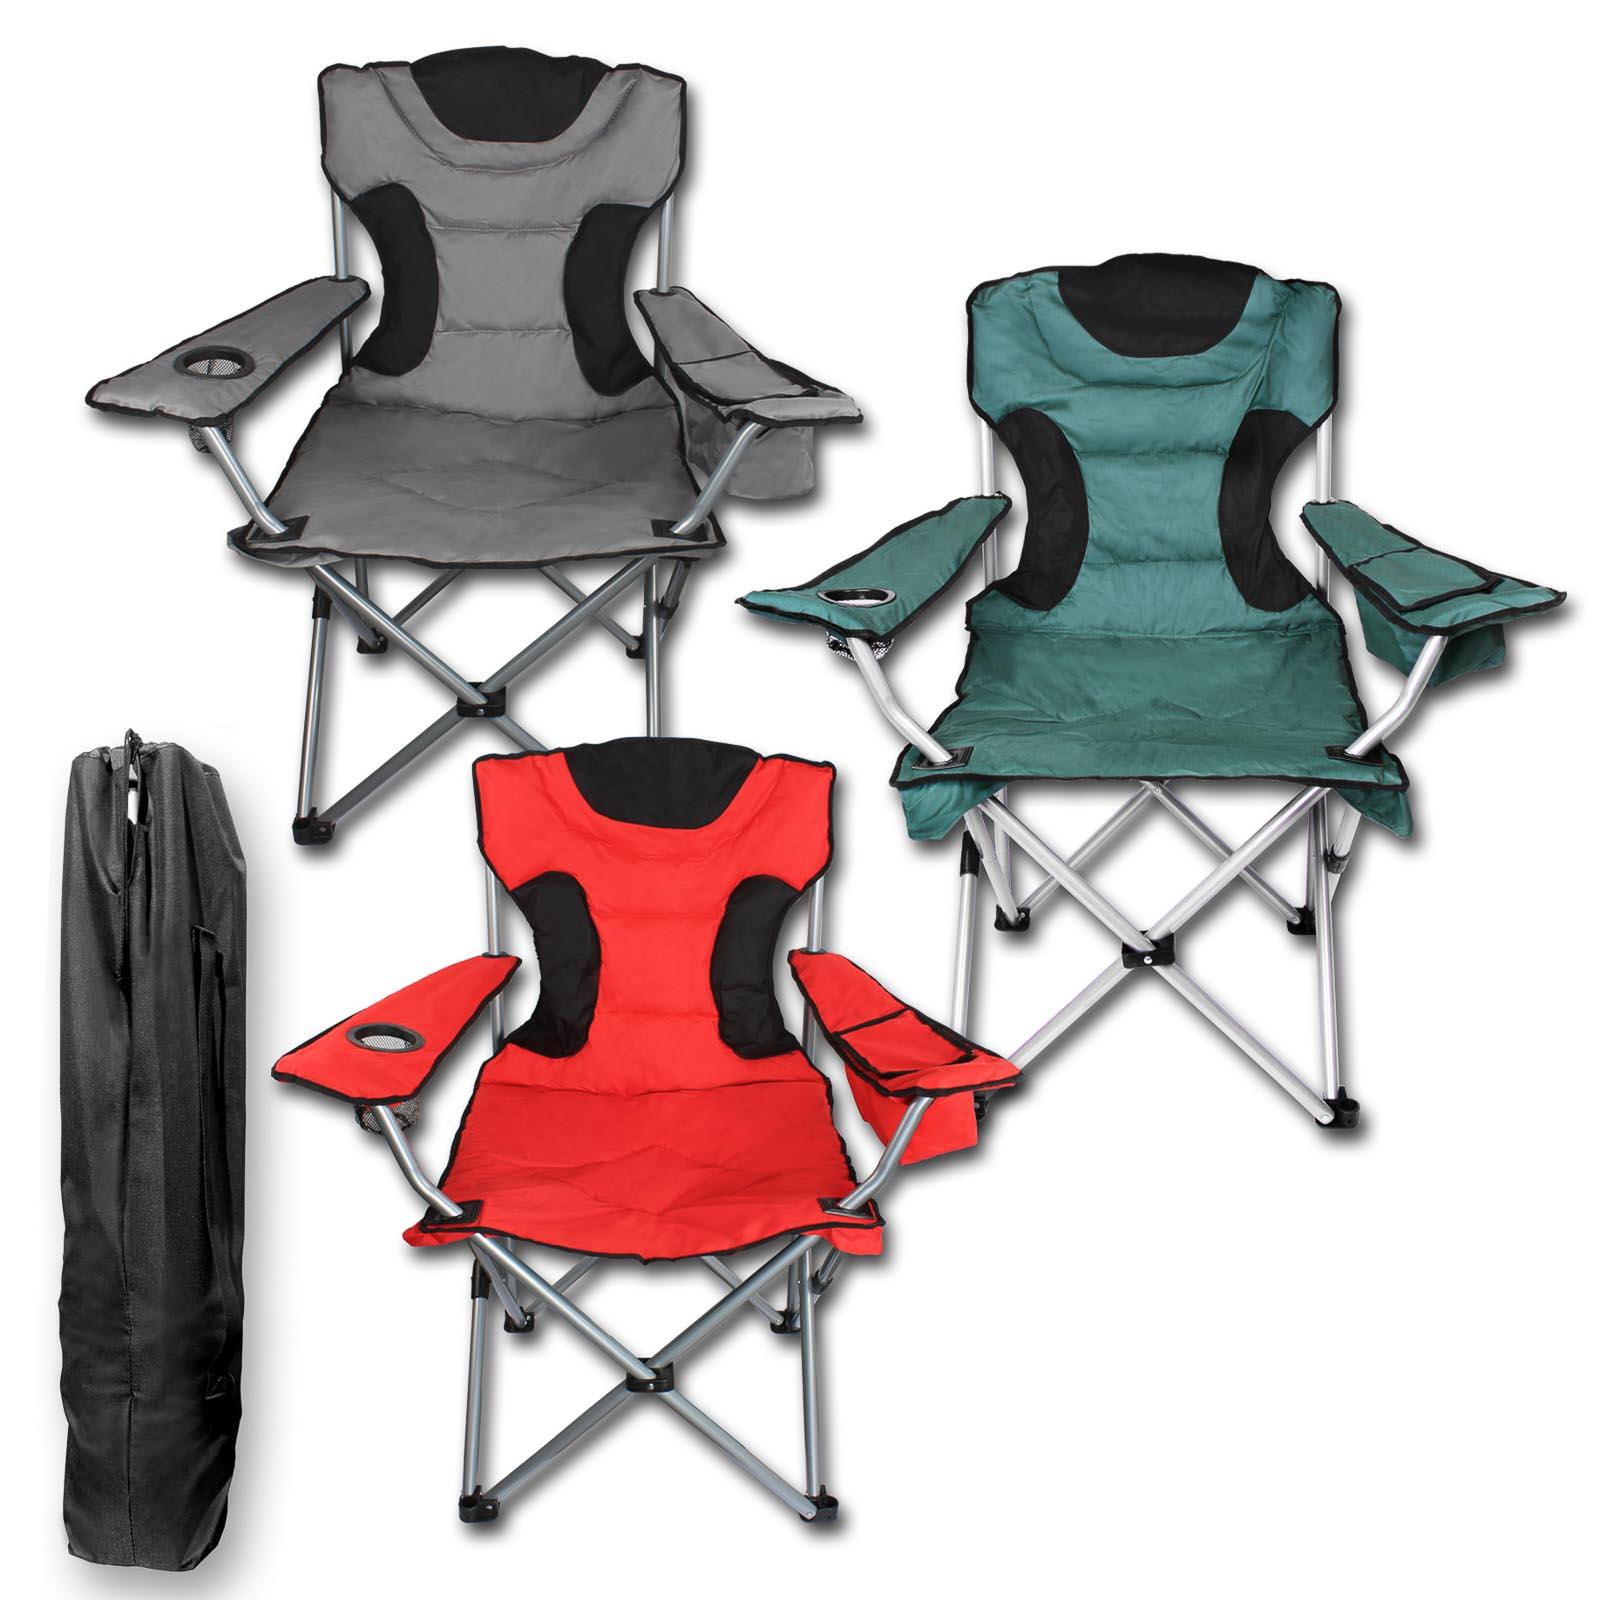 Hochwertiger Camping Klappstuhl der Marke